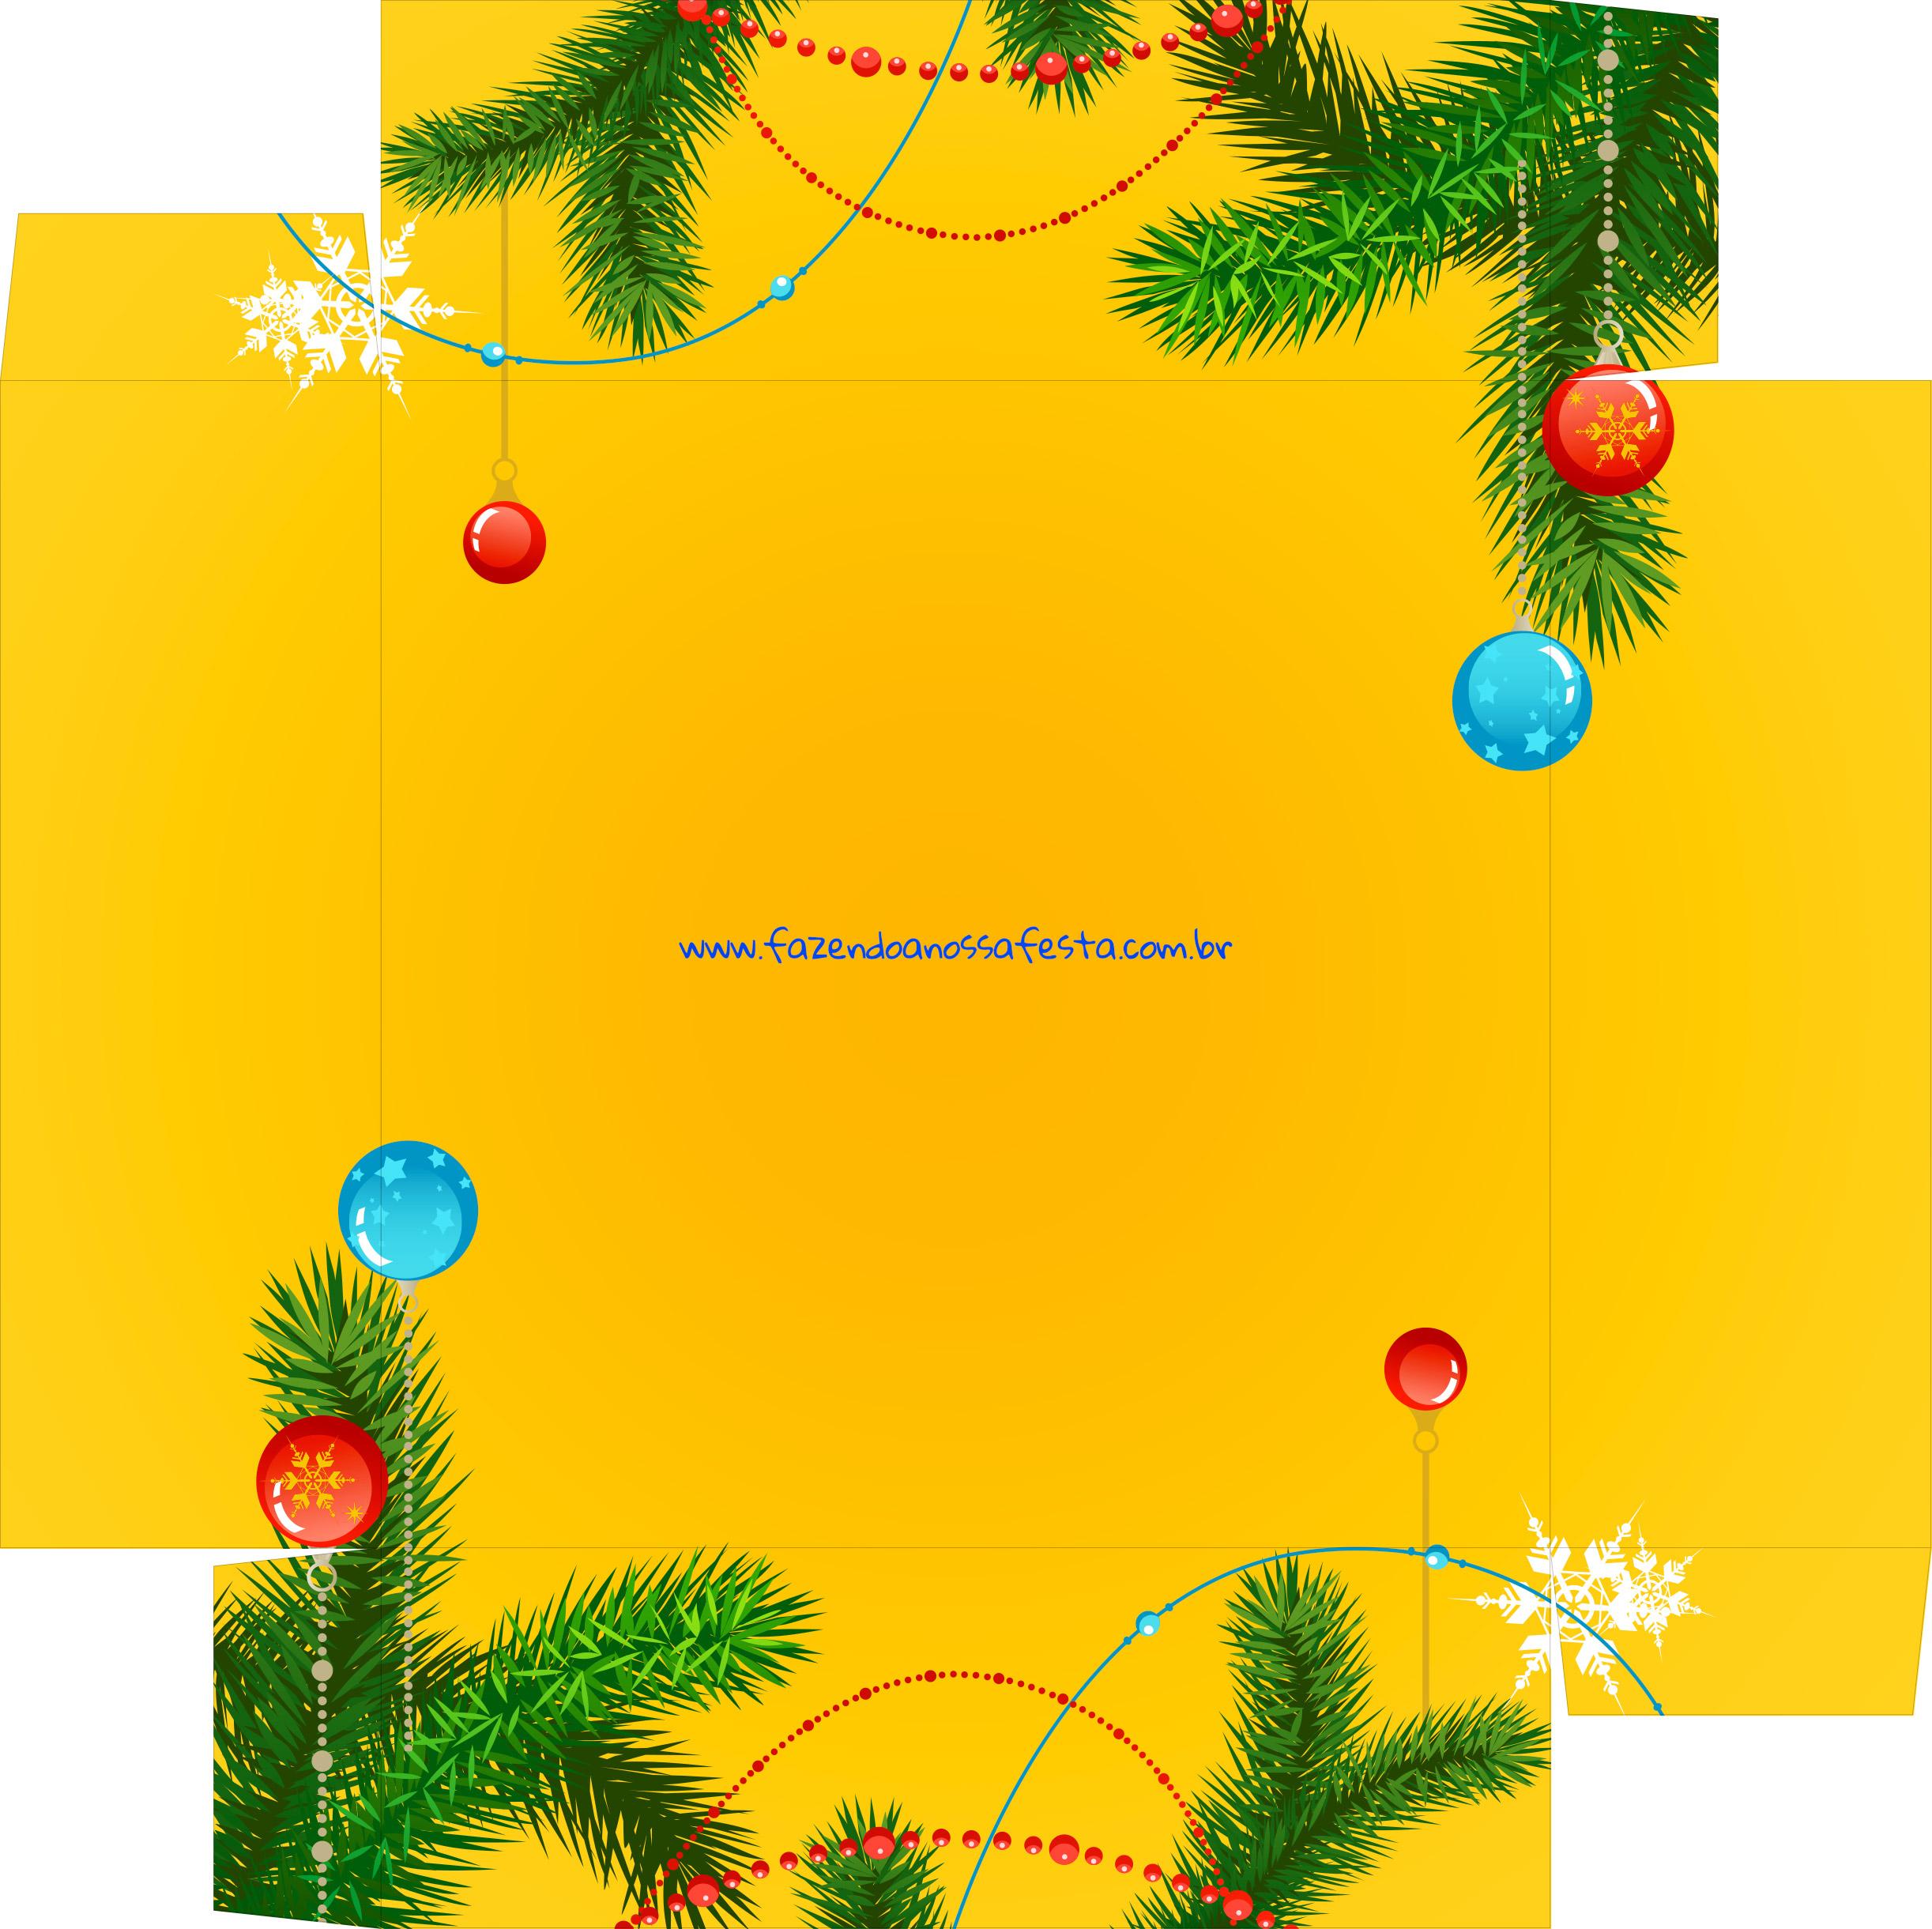 Caixa Bombom Presente Natal - parte de baixo